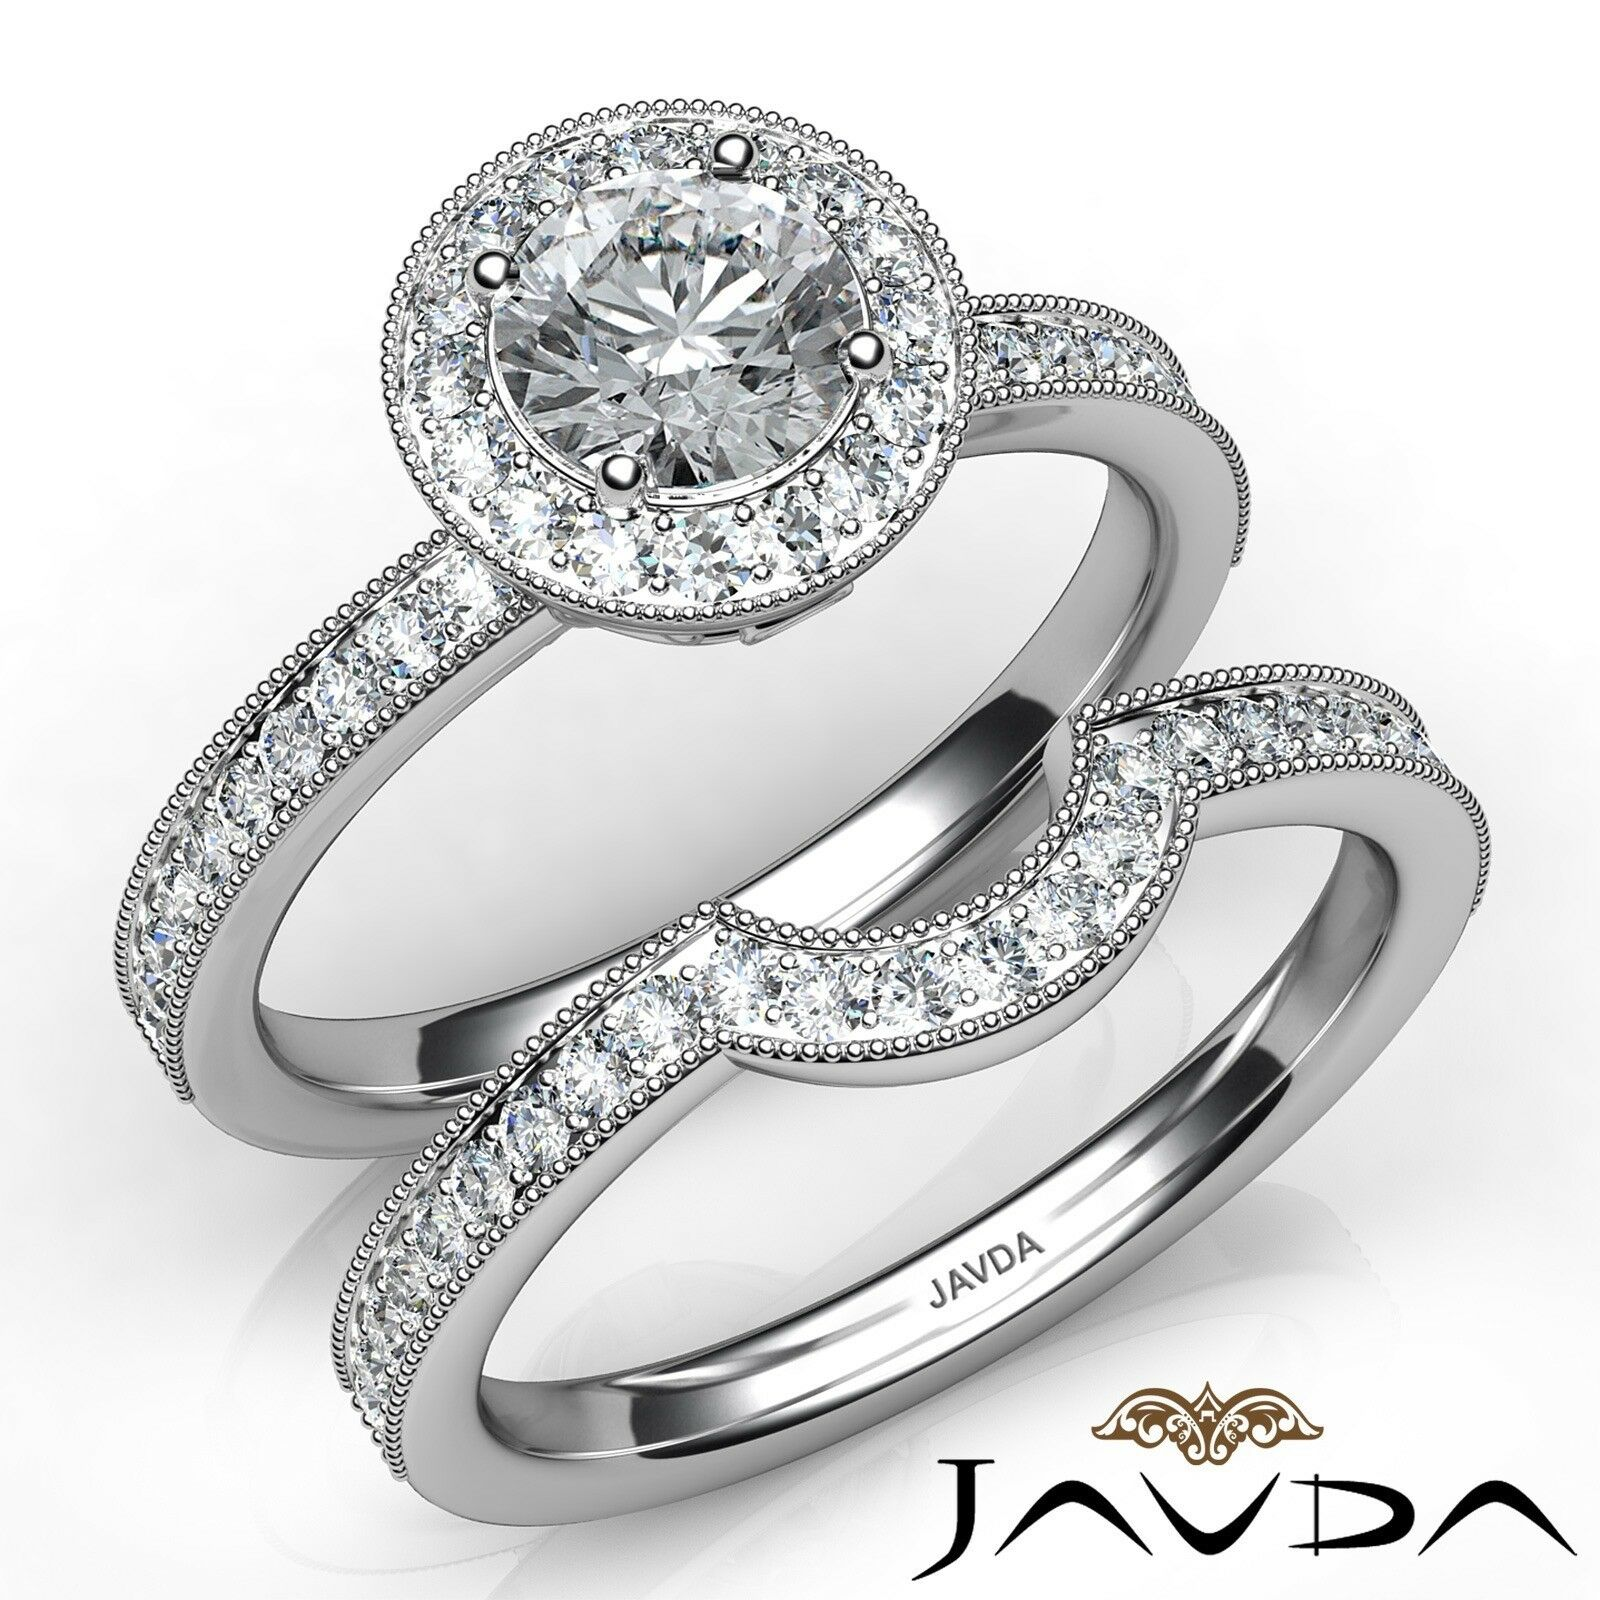 1.45ctw Halo Pave Milgrain Bridal Round Diamond Engagement Ring GIA E-VS1 Gold